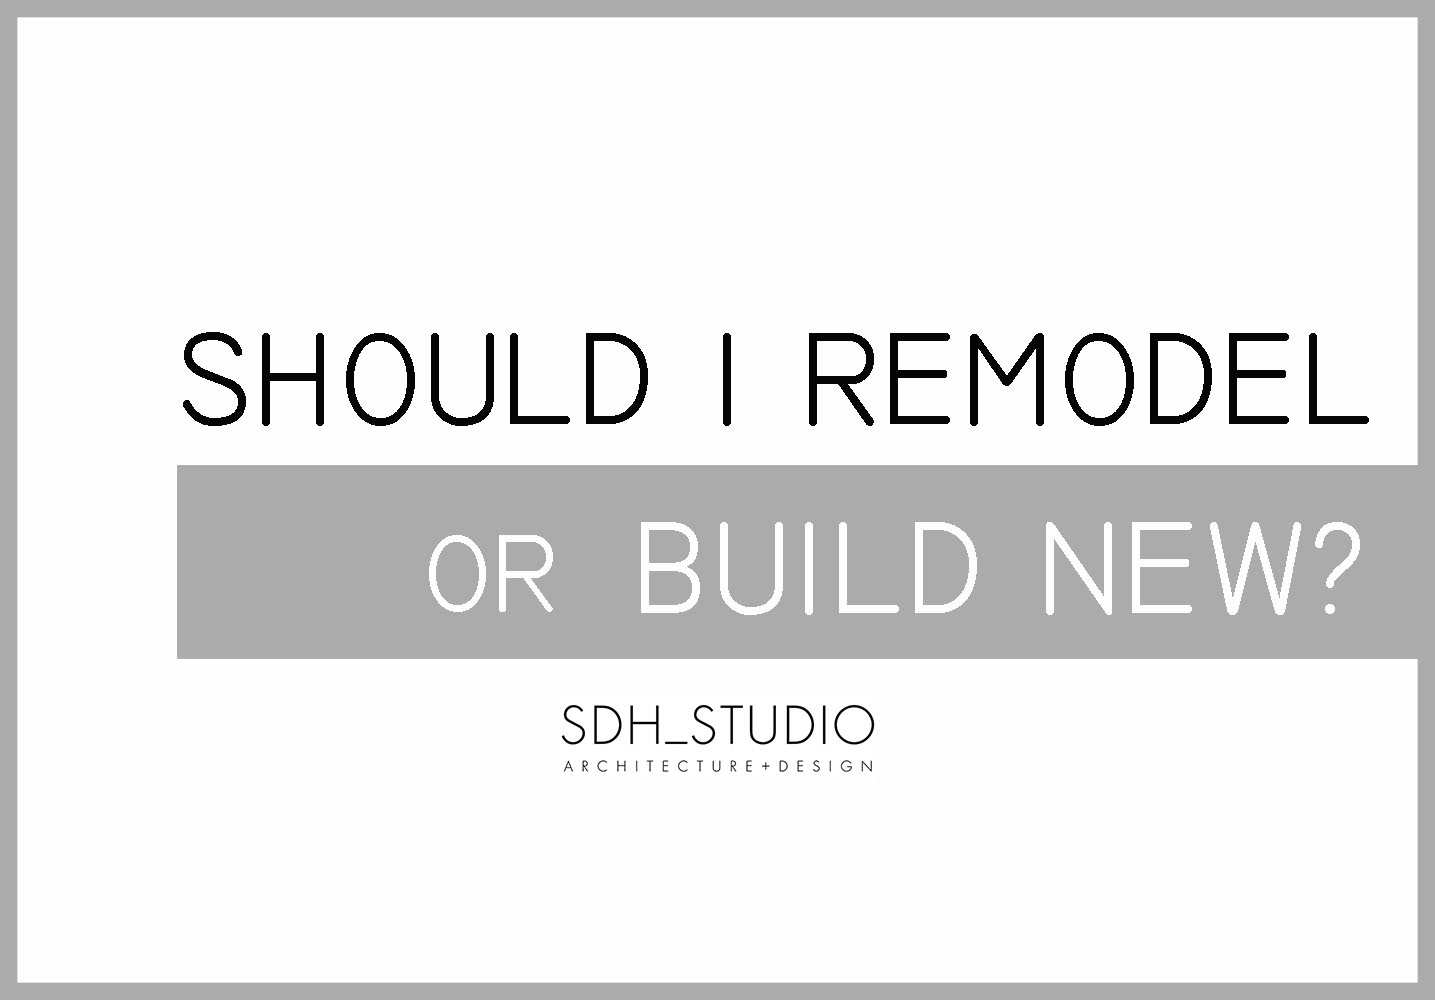 Should I remodel or build new?